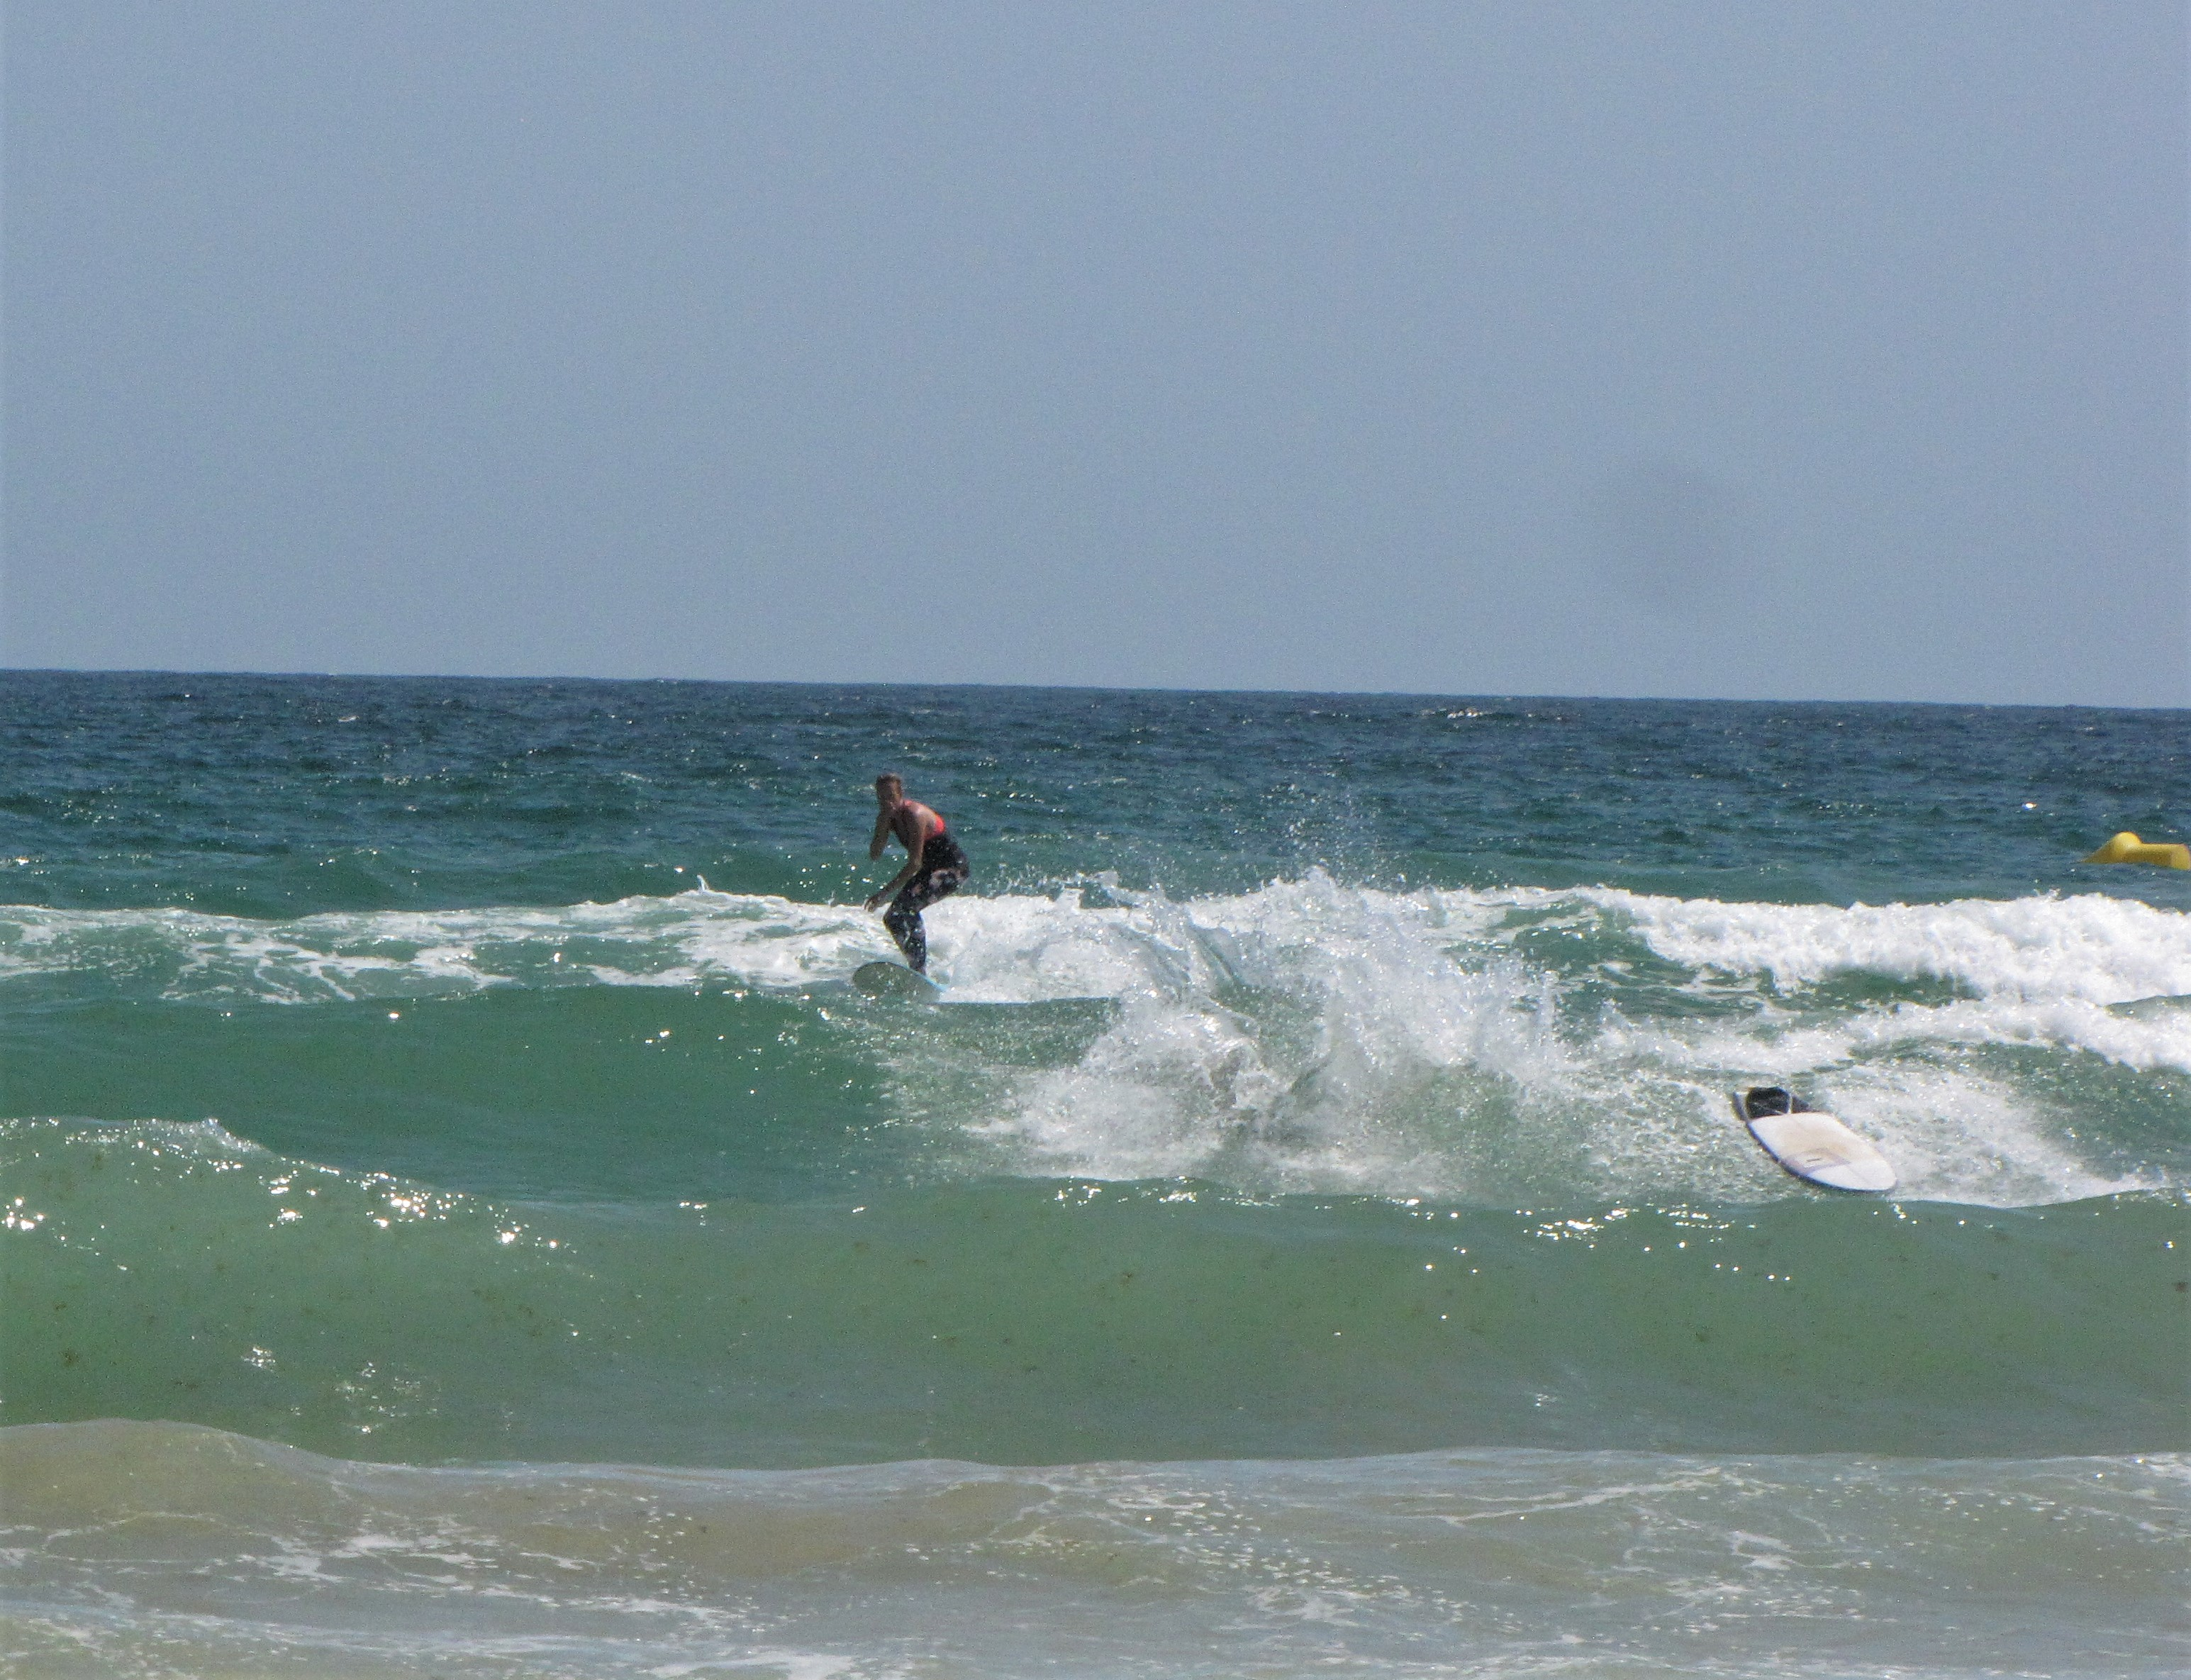 meia praia surf girl